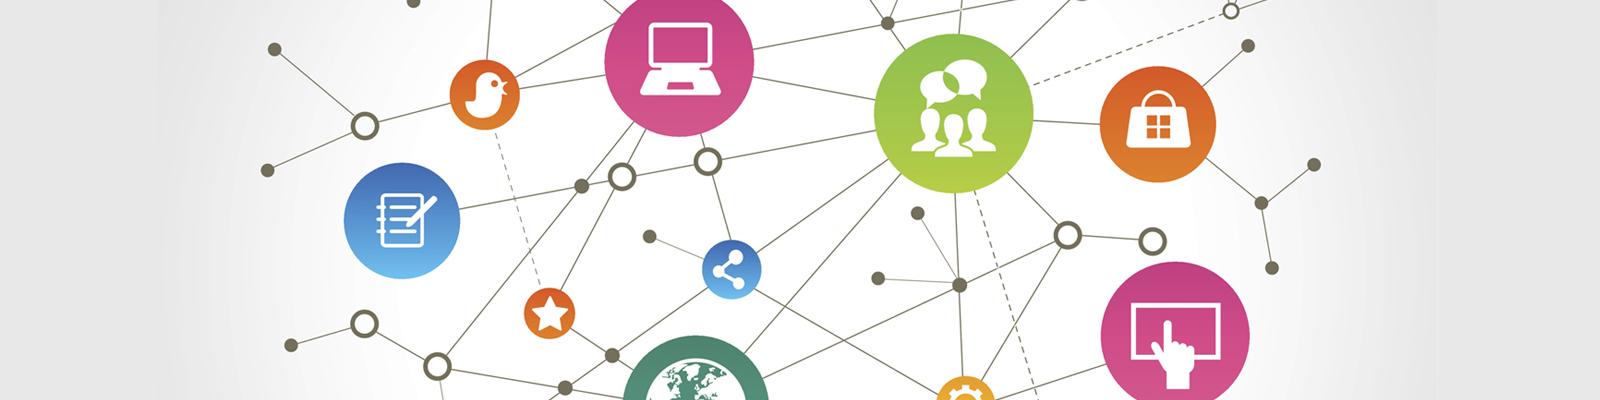 Marvelous Internet Helpdesk Services